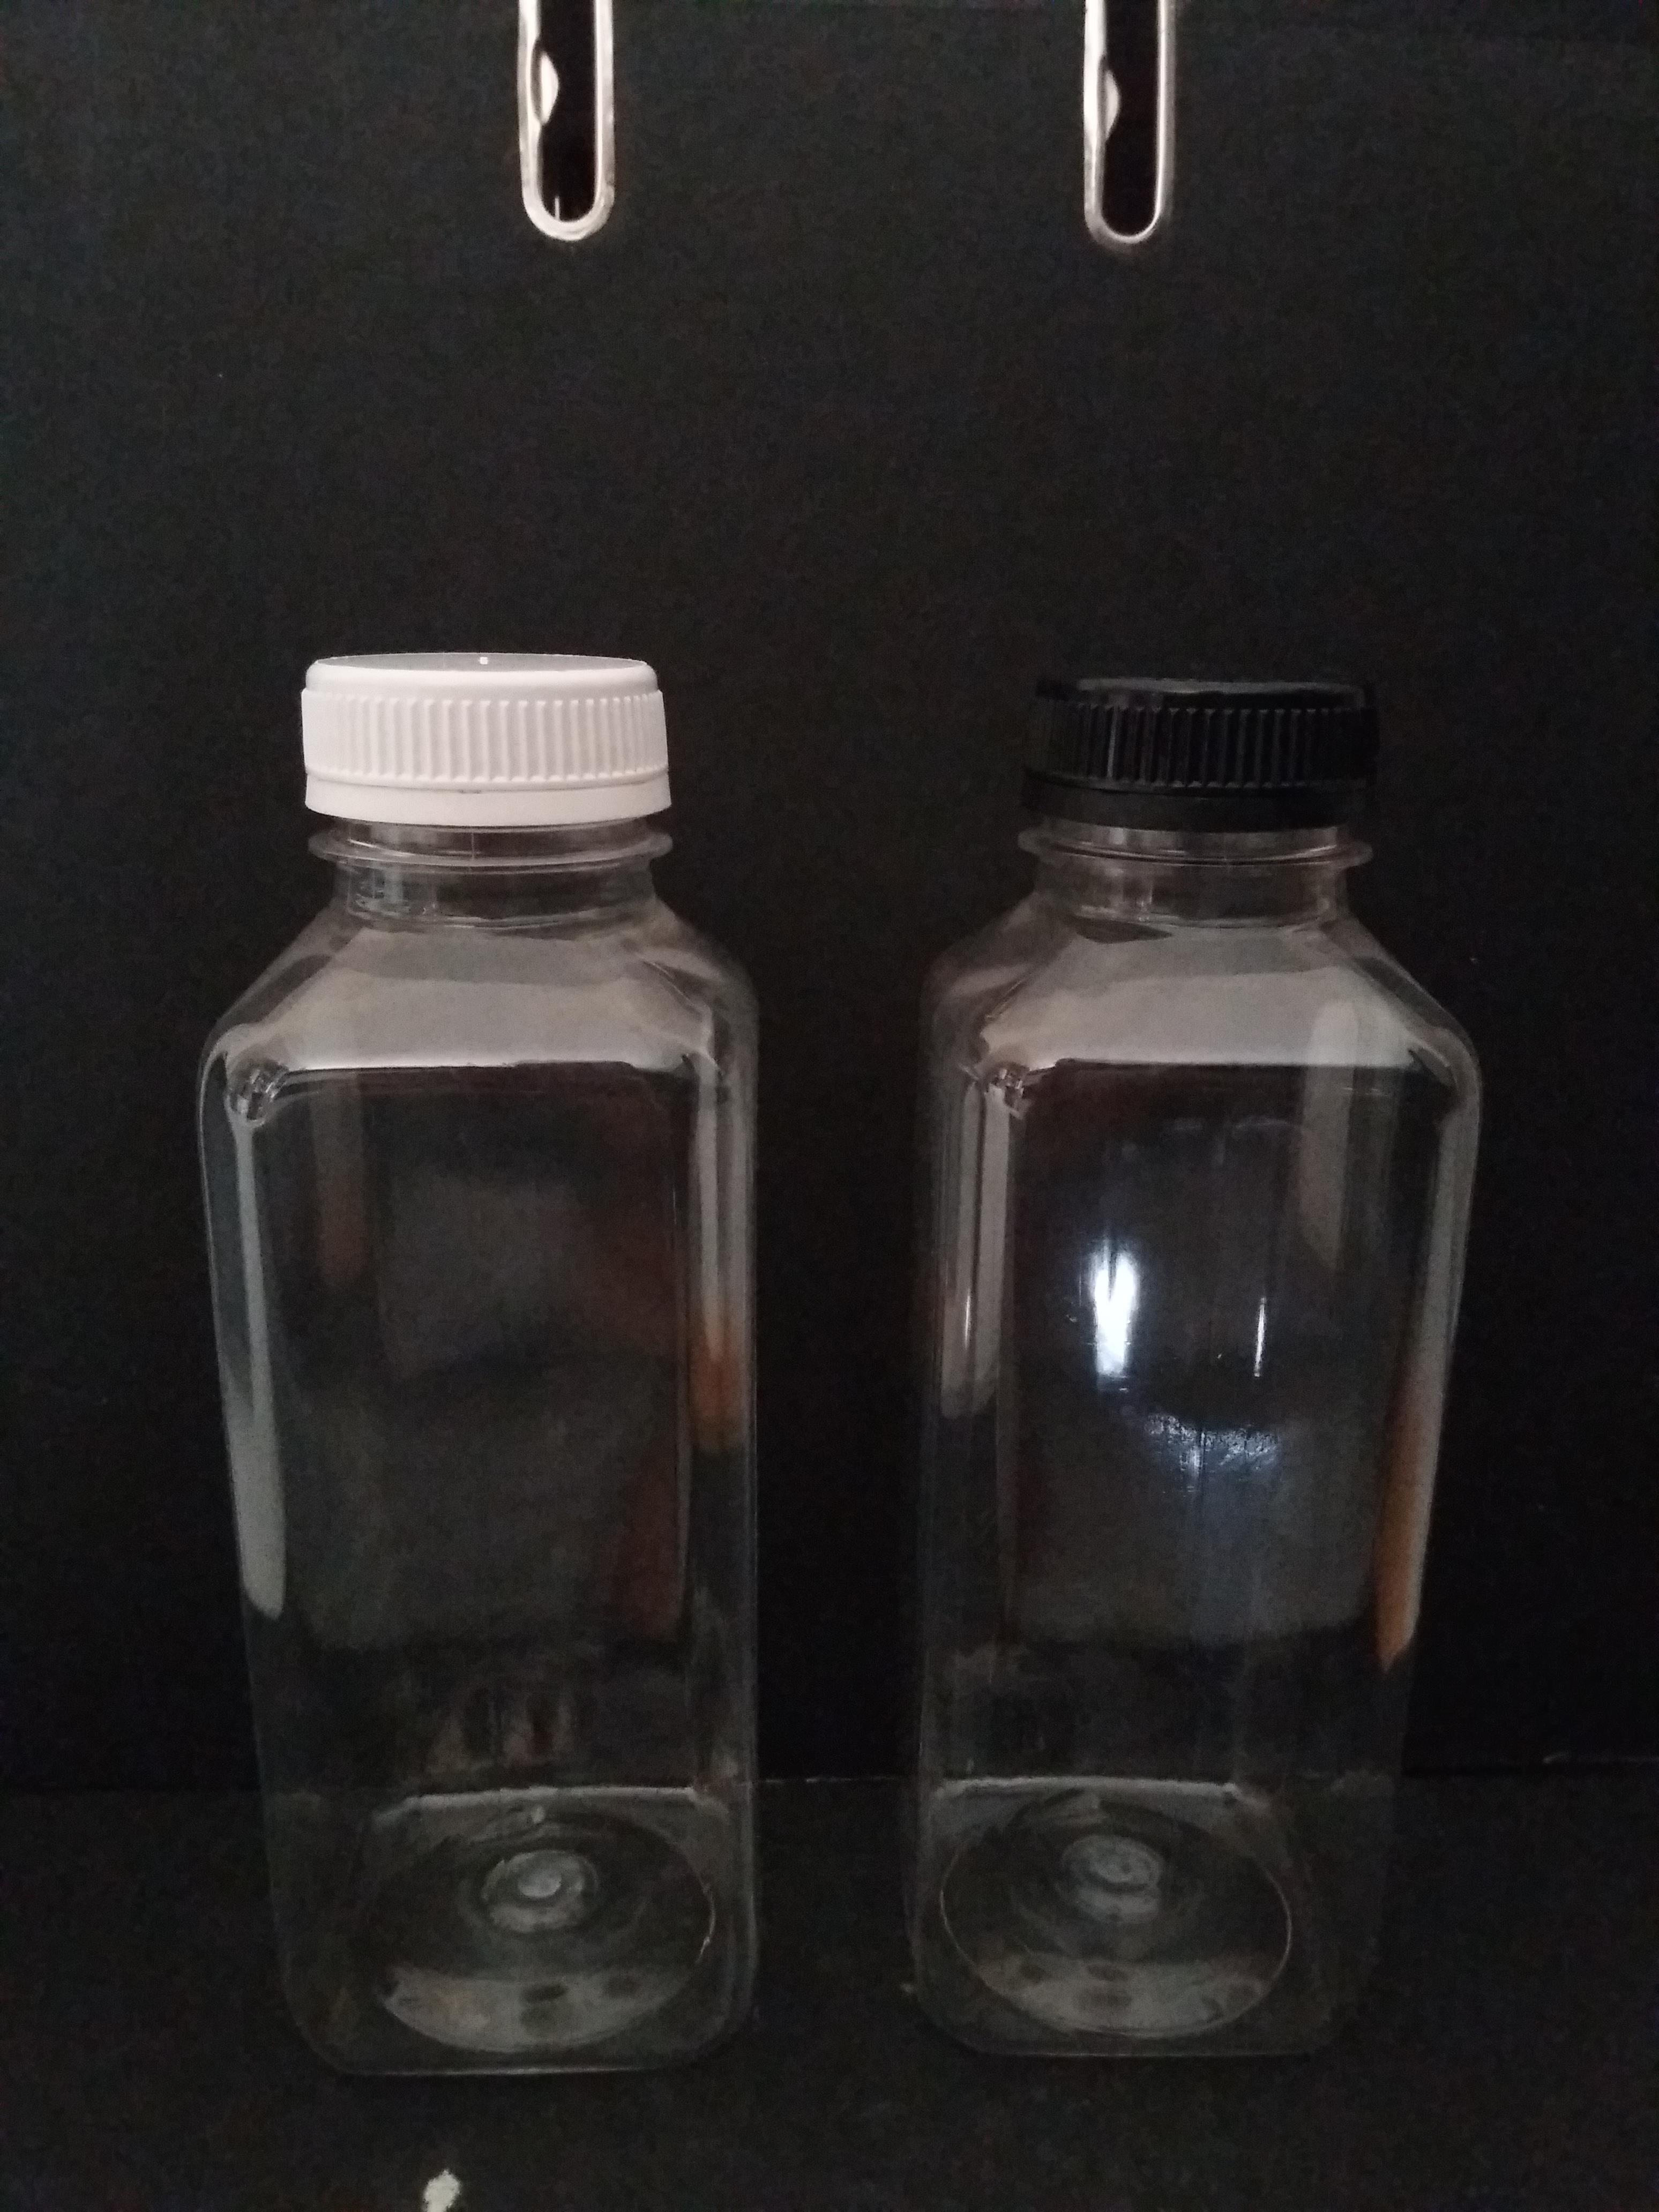 Jual Botol Minuman Plastik Kick Juice 500 Ml Termurah